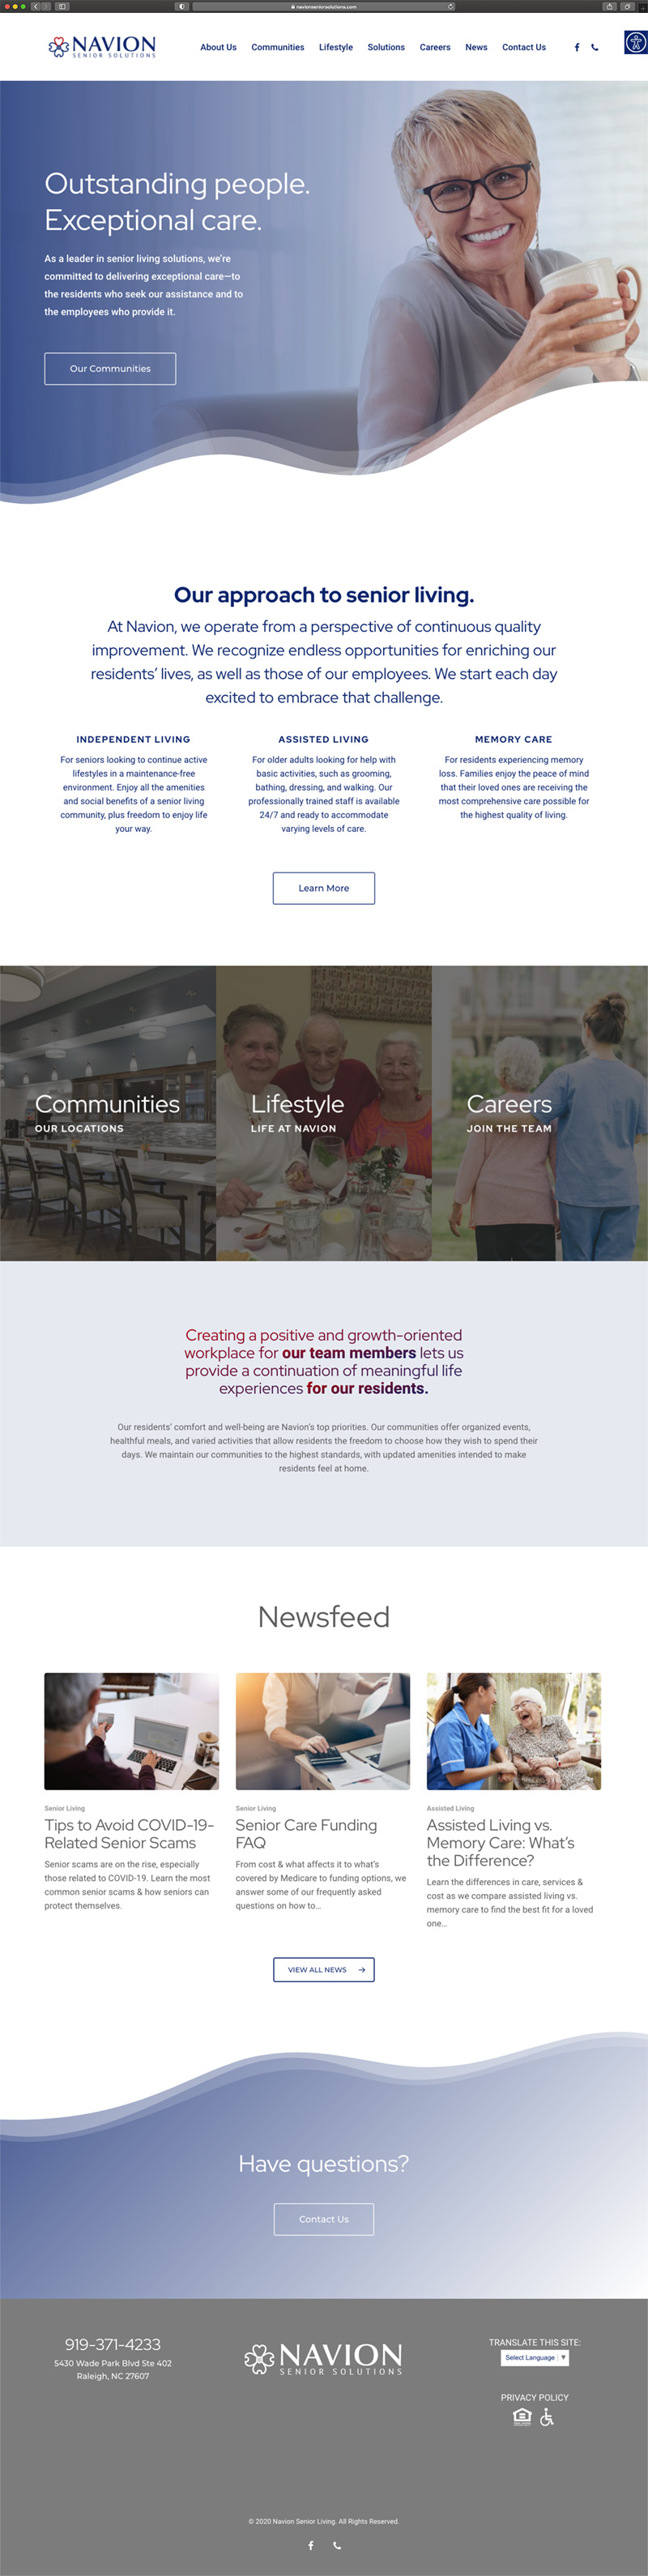 Navion Homepage